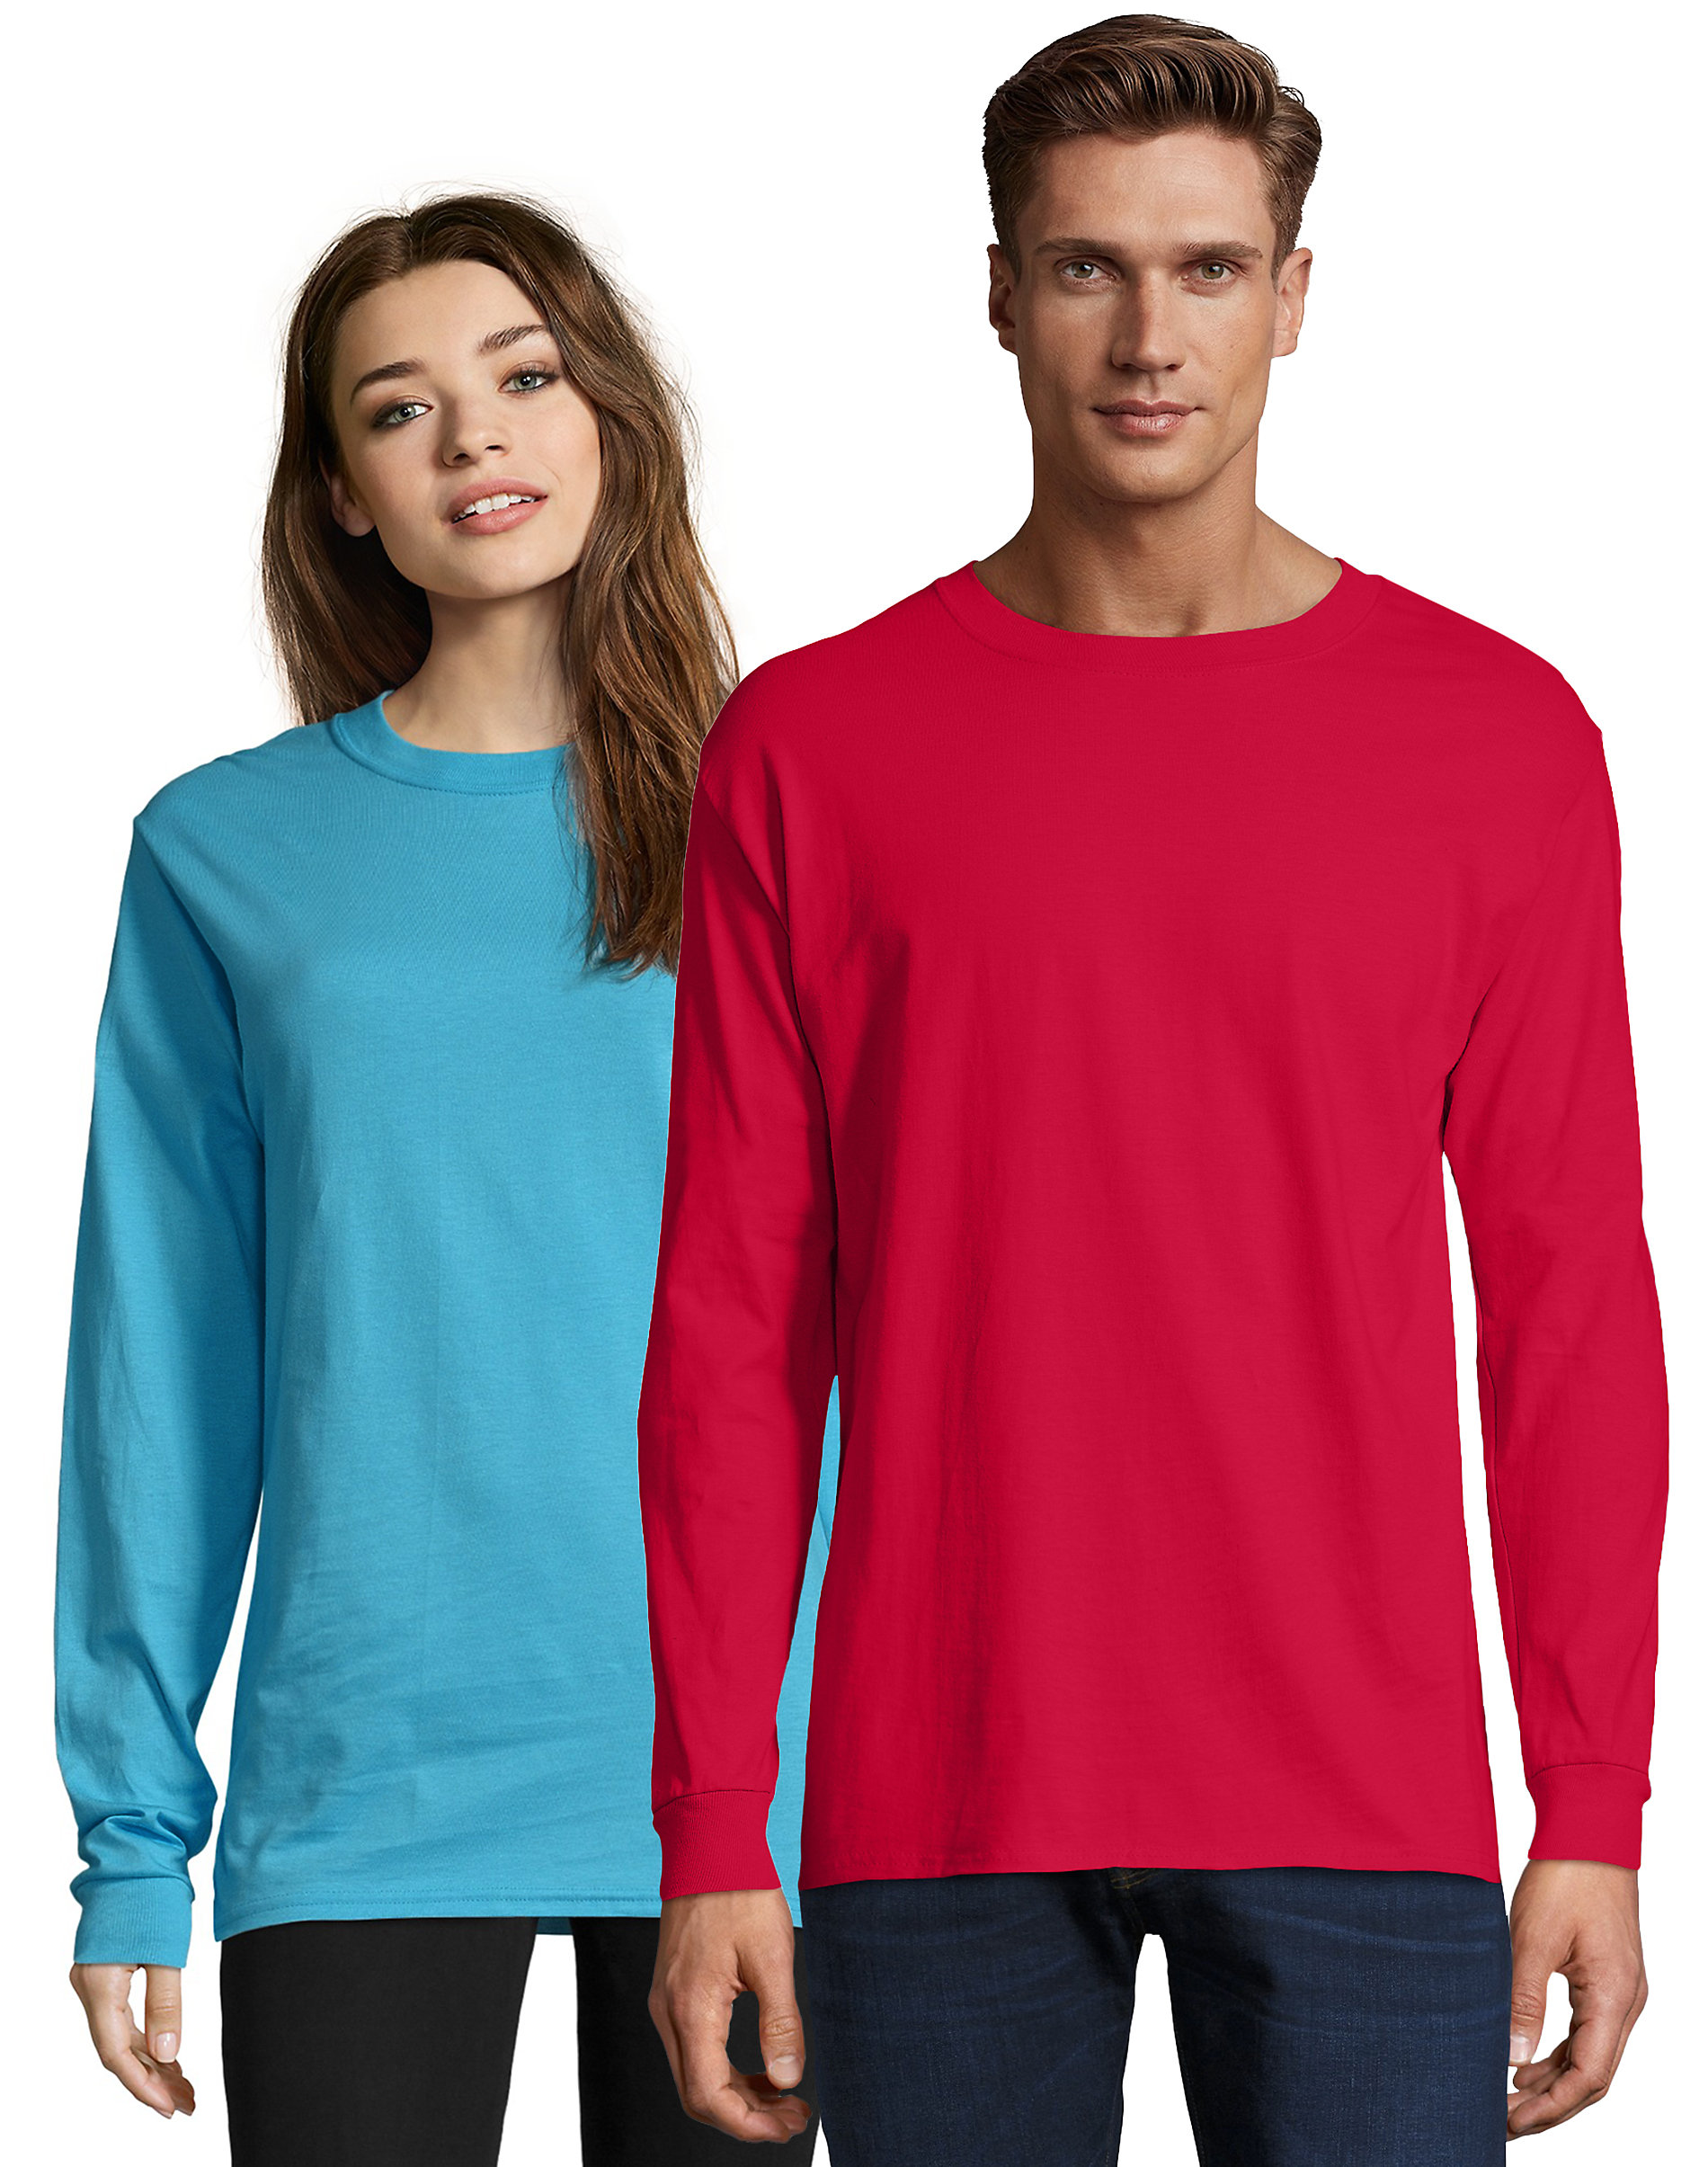 fc7c36e8 Hanes Beefy T Shirts 100 Cotton | BET-C